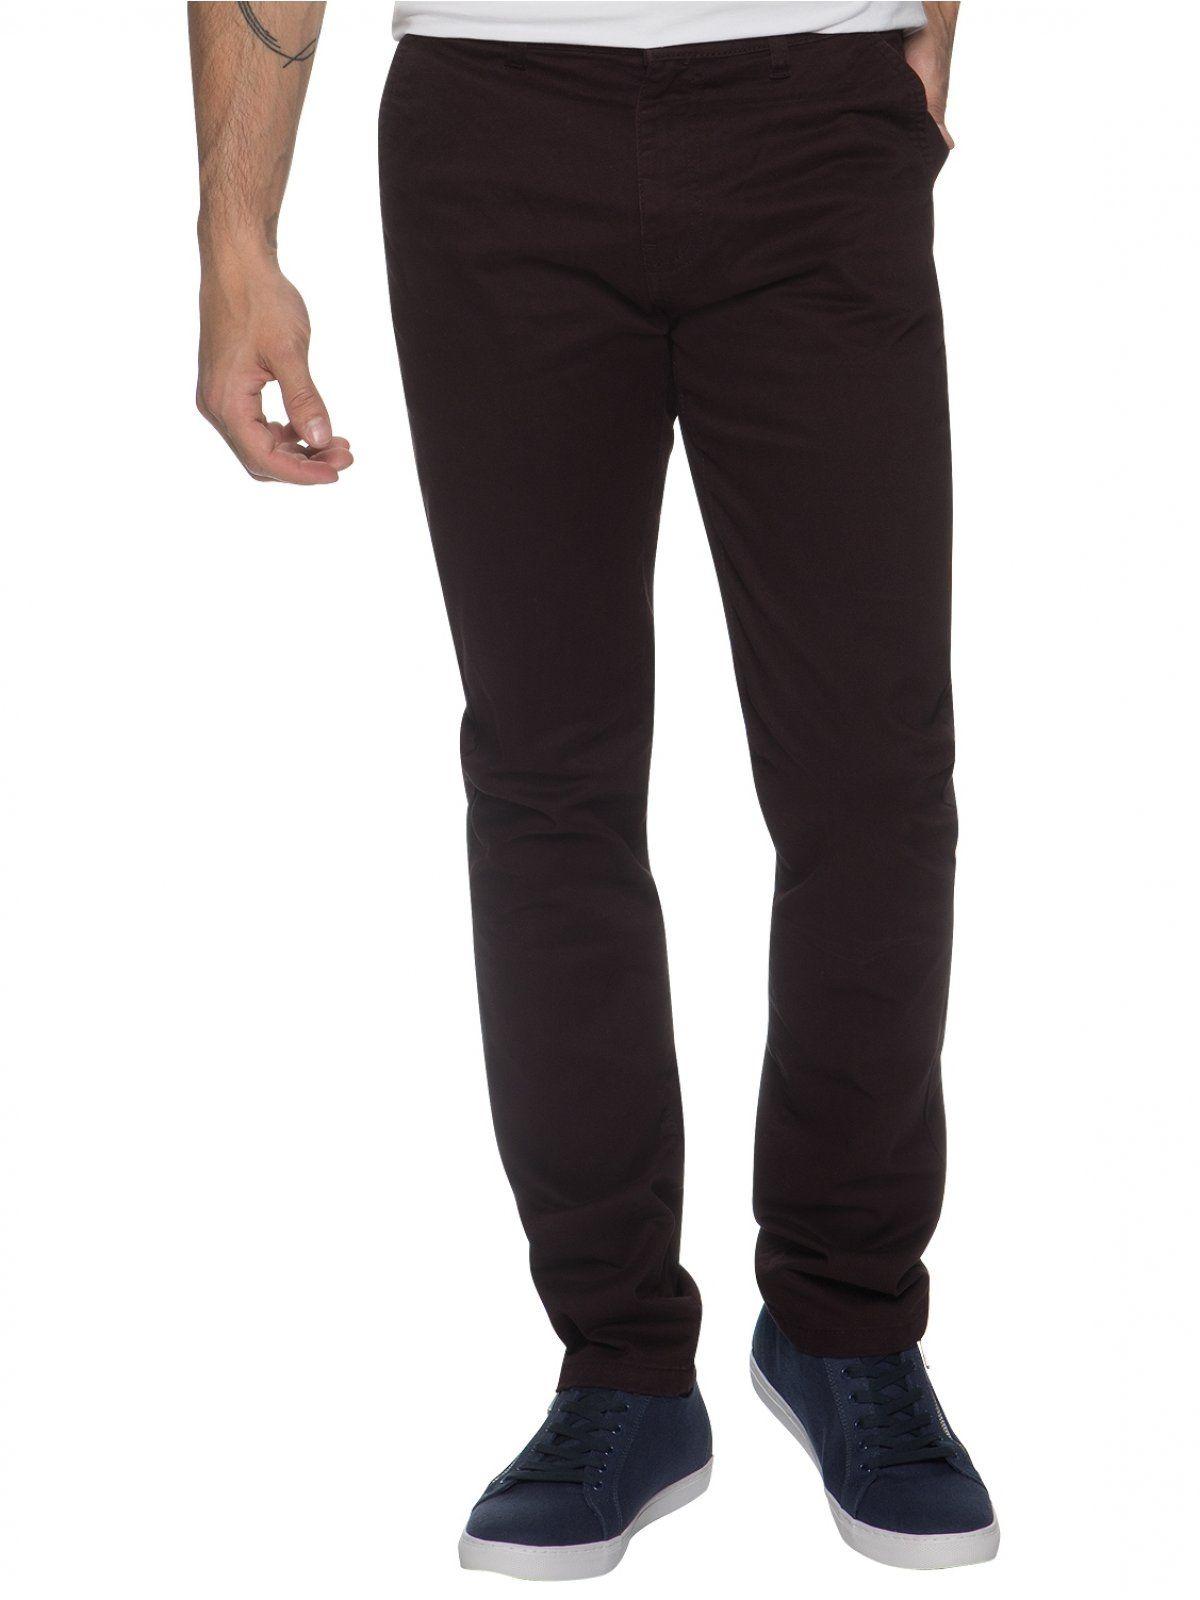 Mens Chinos Slim Fit Stretch Jeans | Enzo Designer Menswear